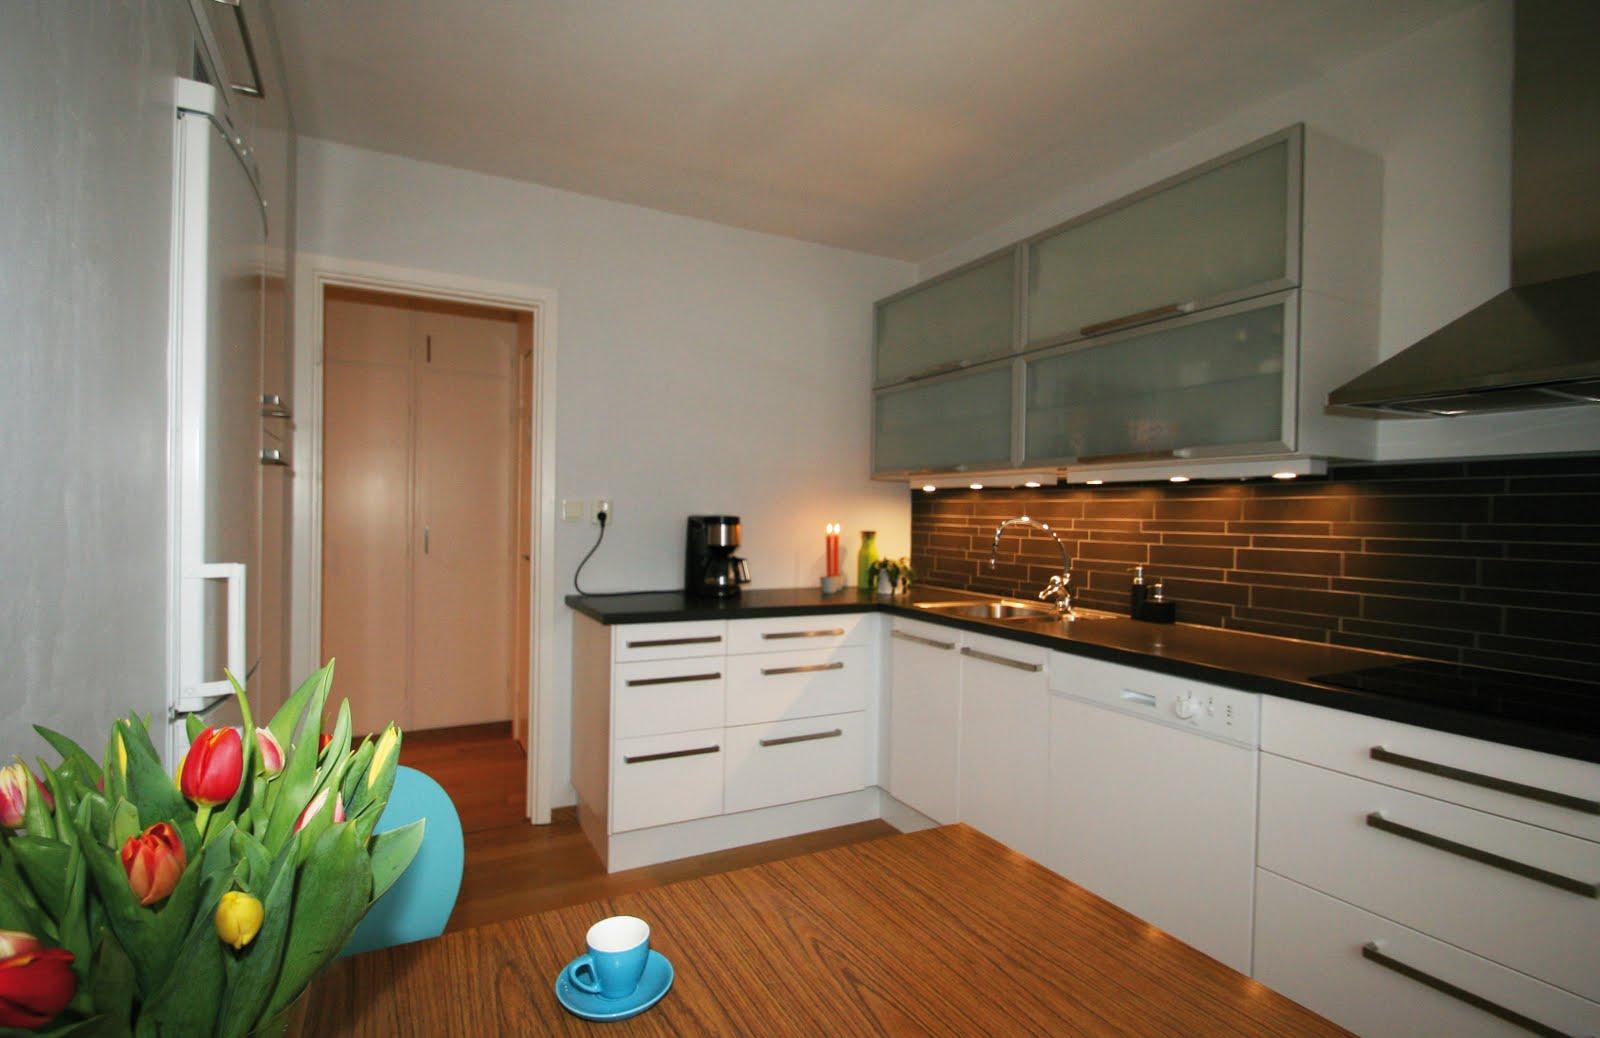 Liedbergsgatan 29d